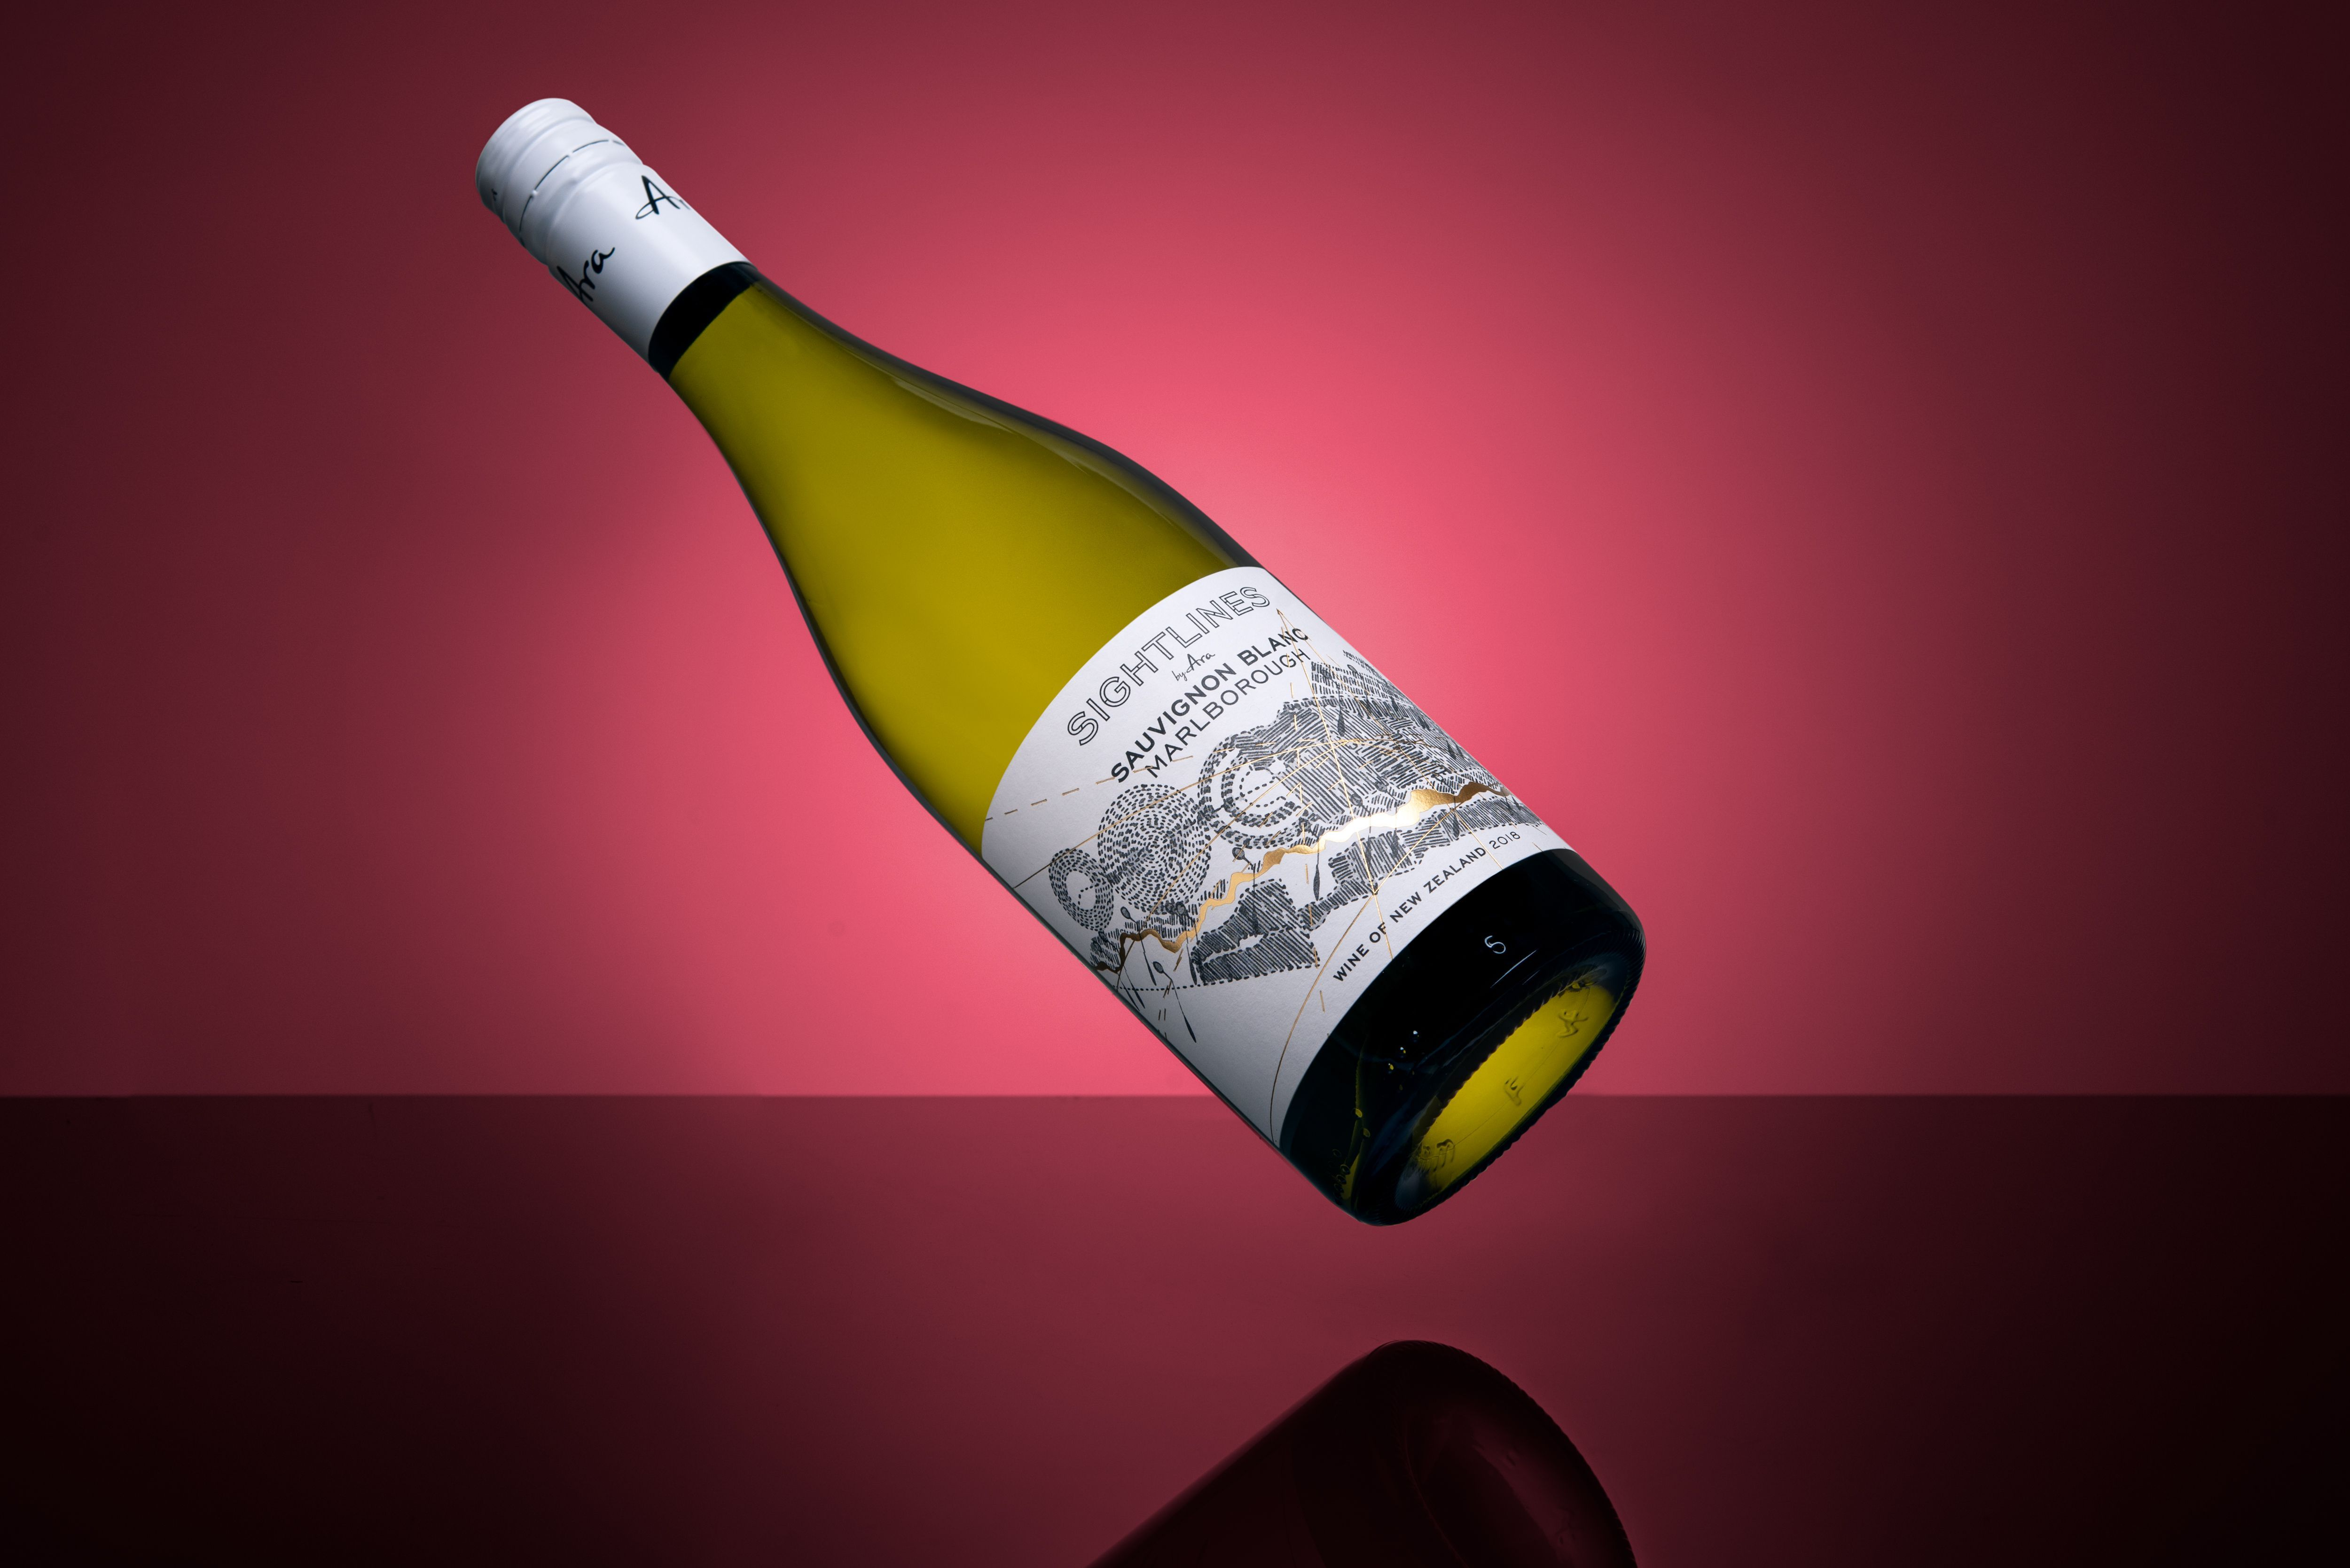 Ara Wines Sauvignon Blanc Wine Label With Beautiful Detailed Gold Hot Foil Designed By Wine Creatives And Sauvignon Blanc Wine Wine And Spirits Sauvignon Blanc